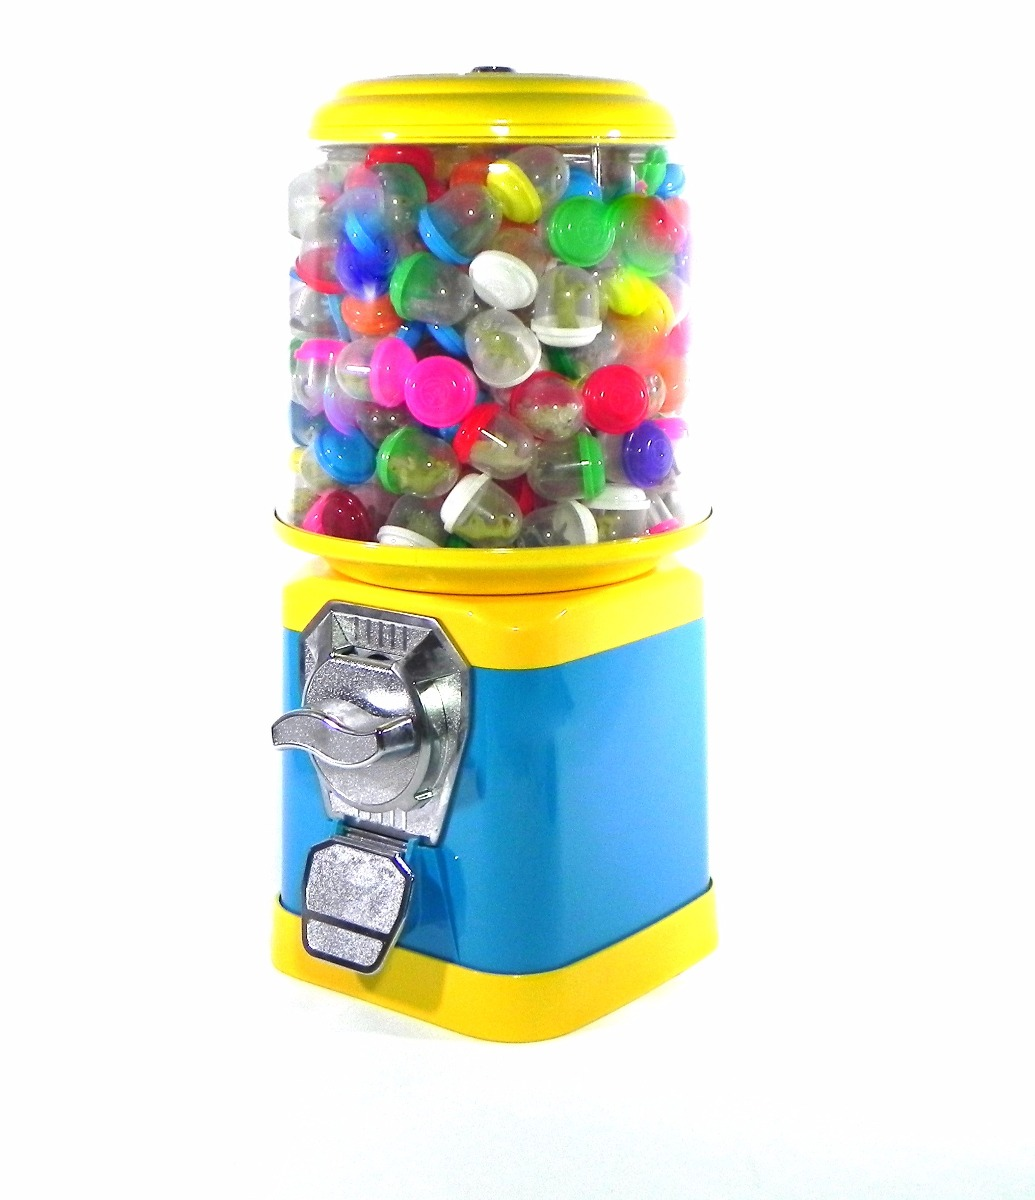 chiclets vending machine